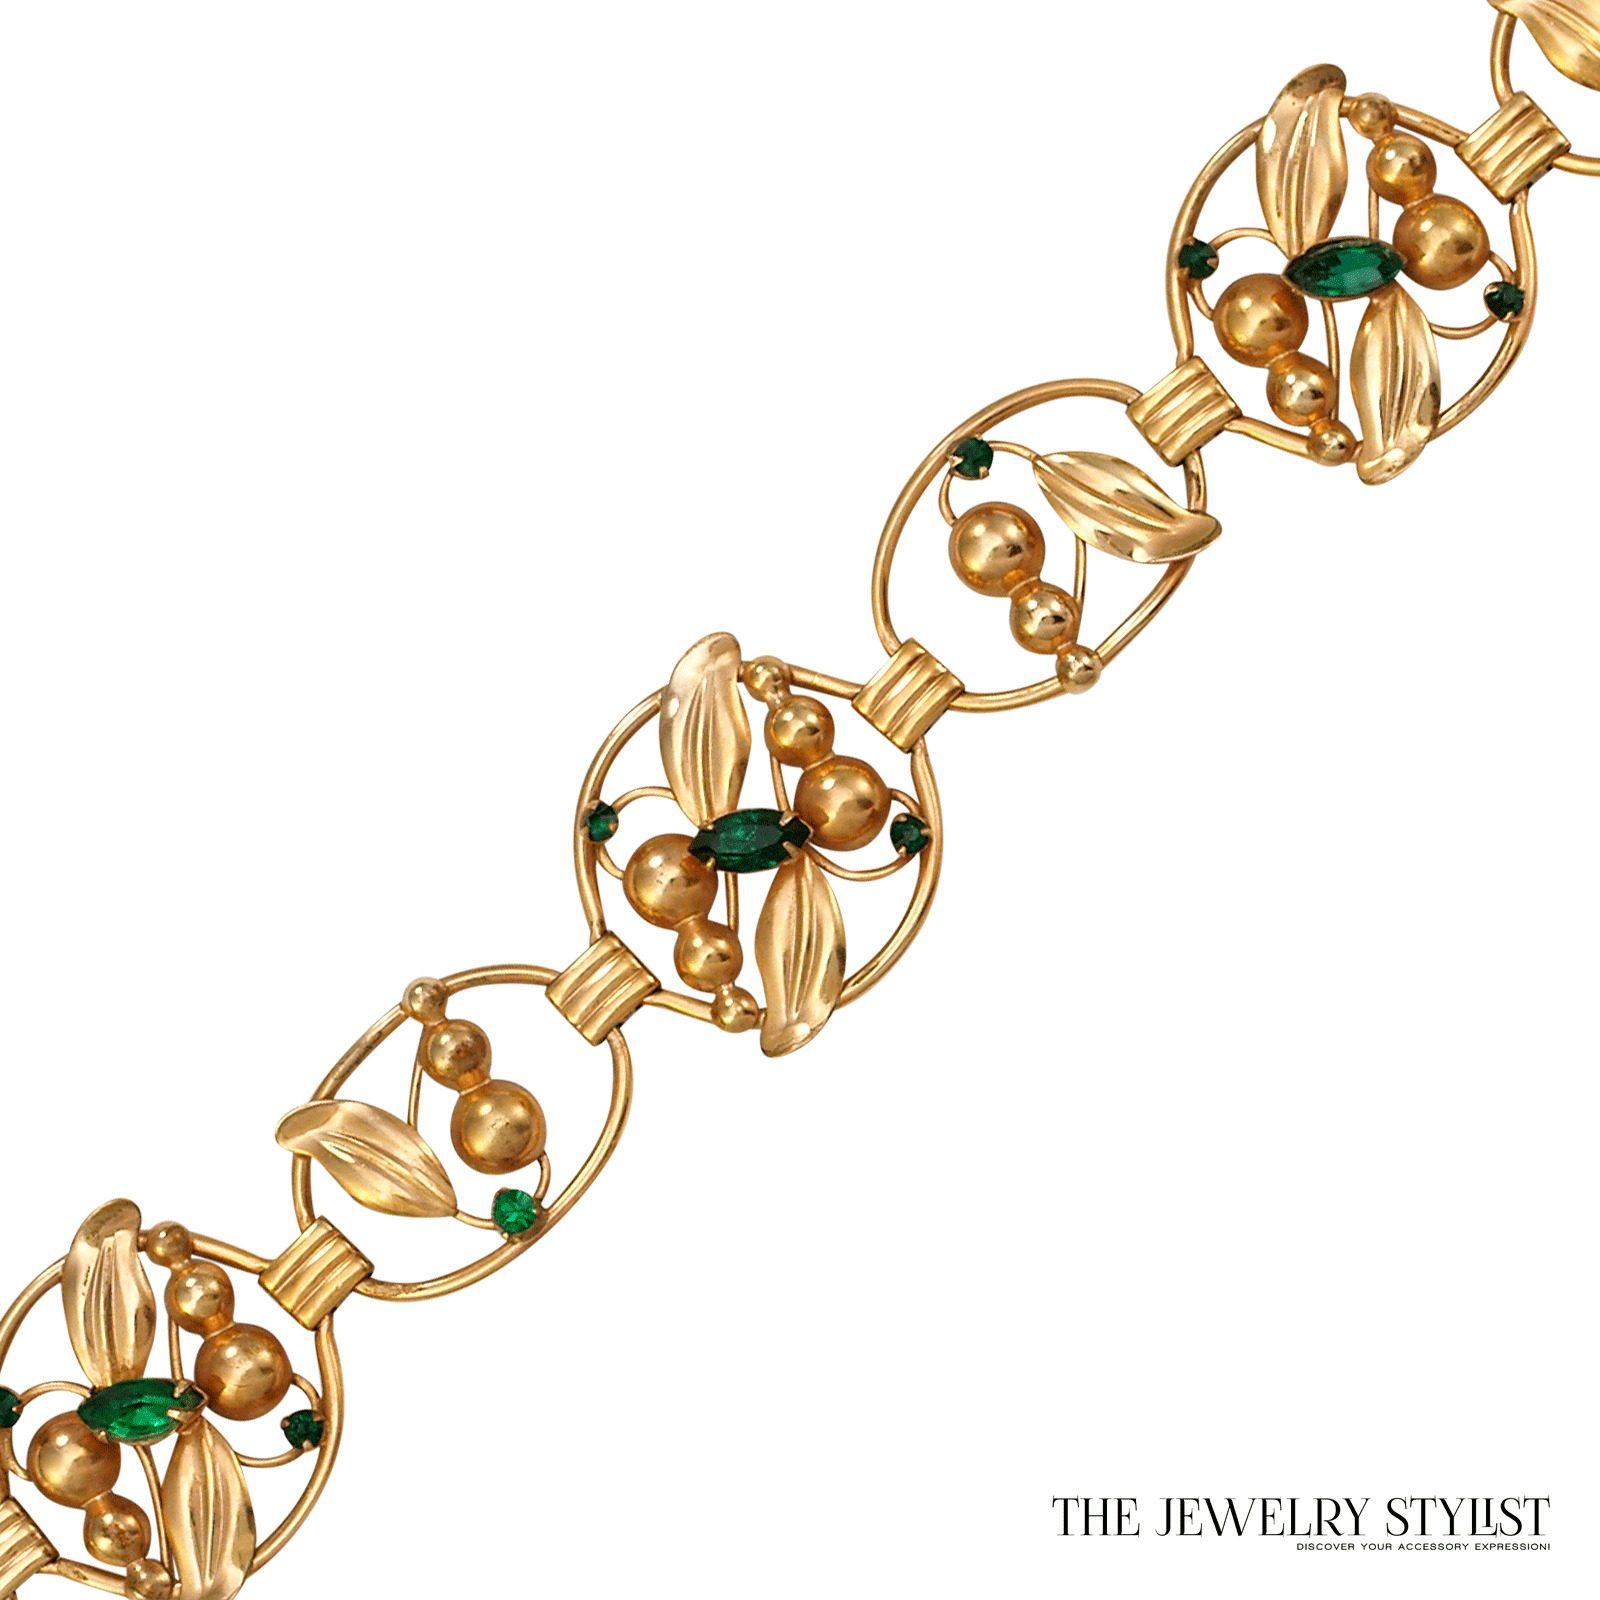 Vintage Gold Filled Rhinestone Bracelet by M & S